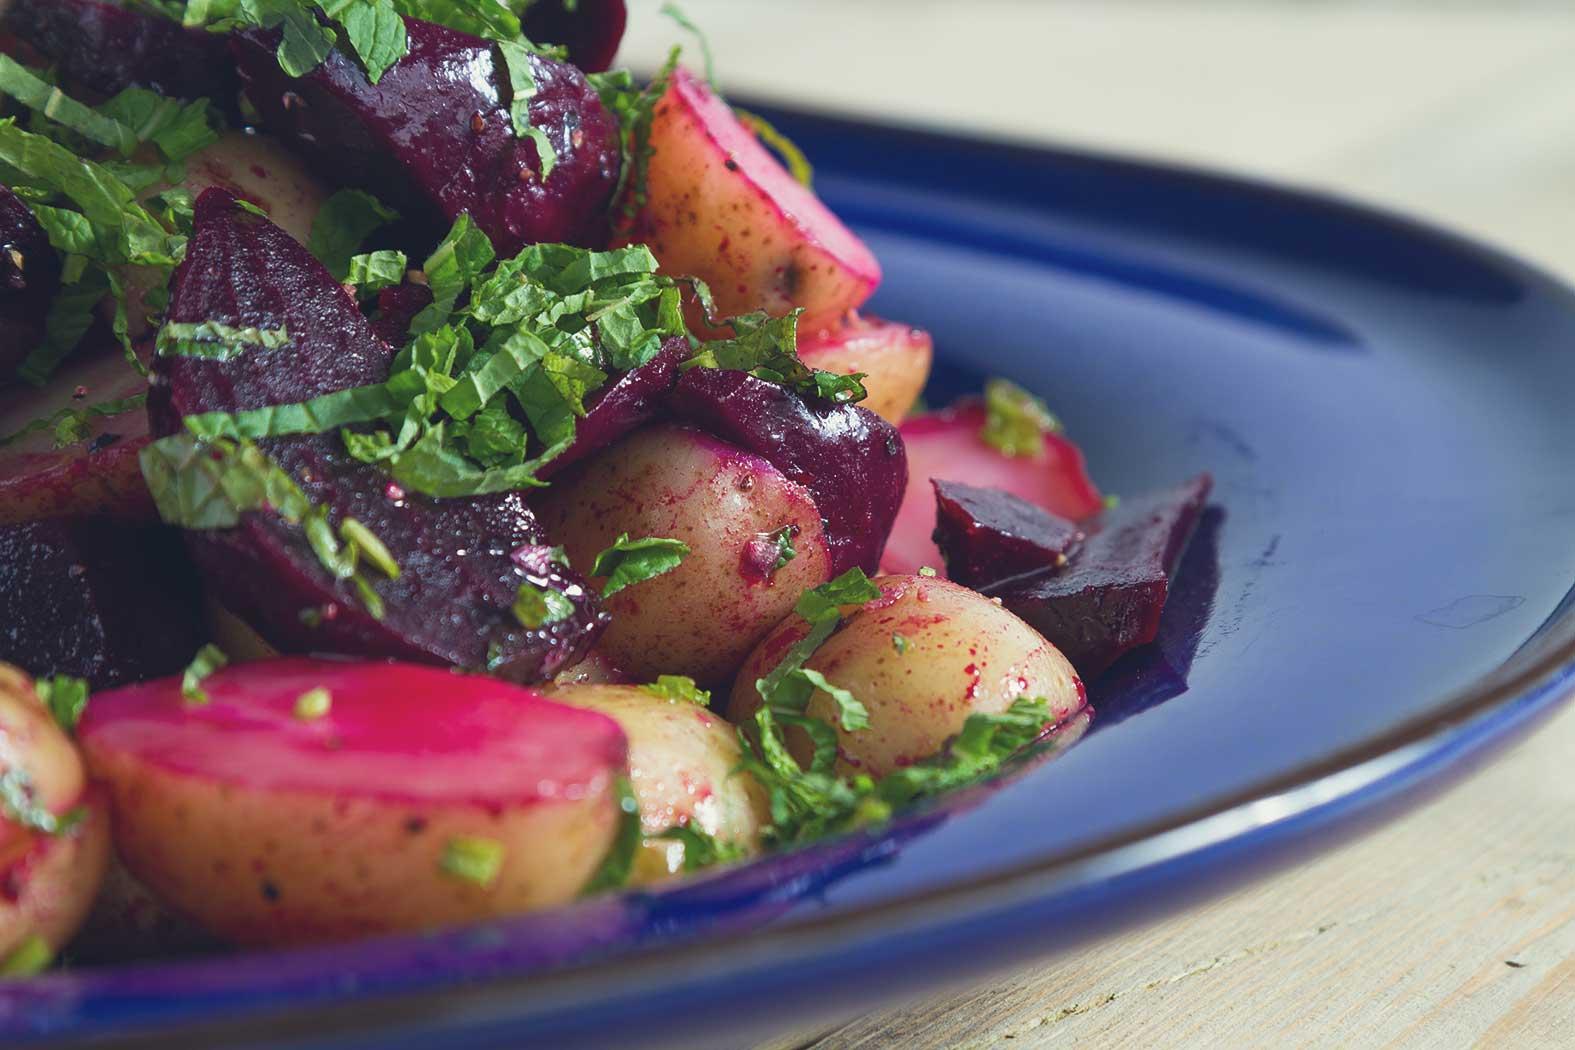 Lunch: Beet Potato Salad